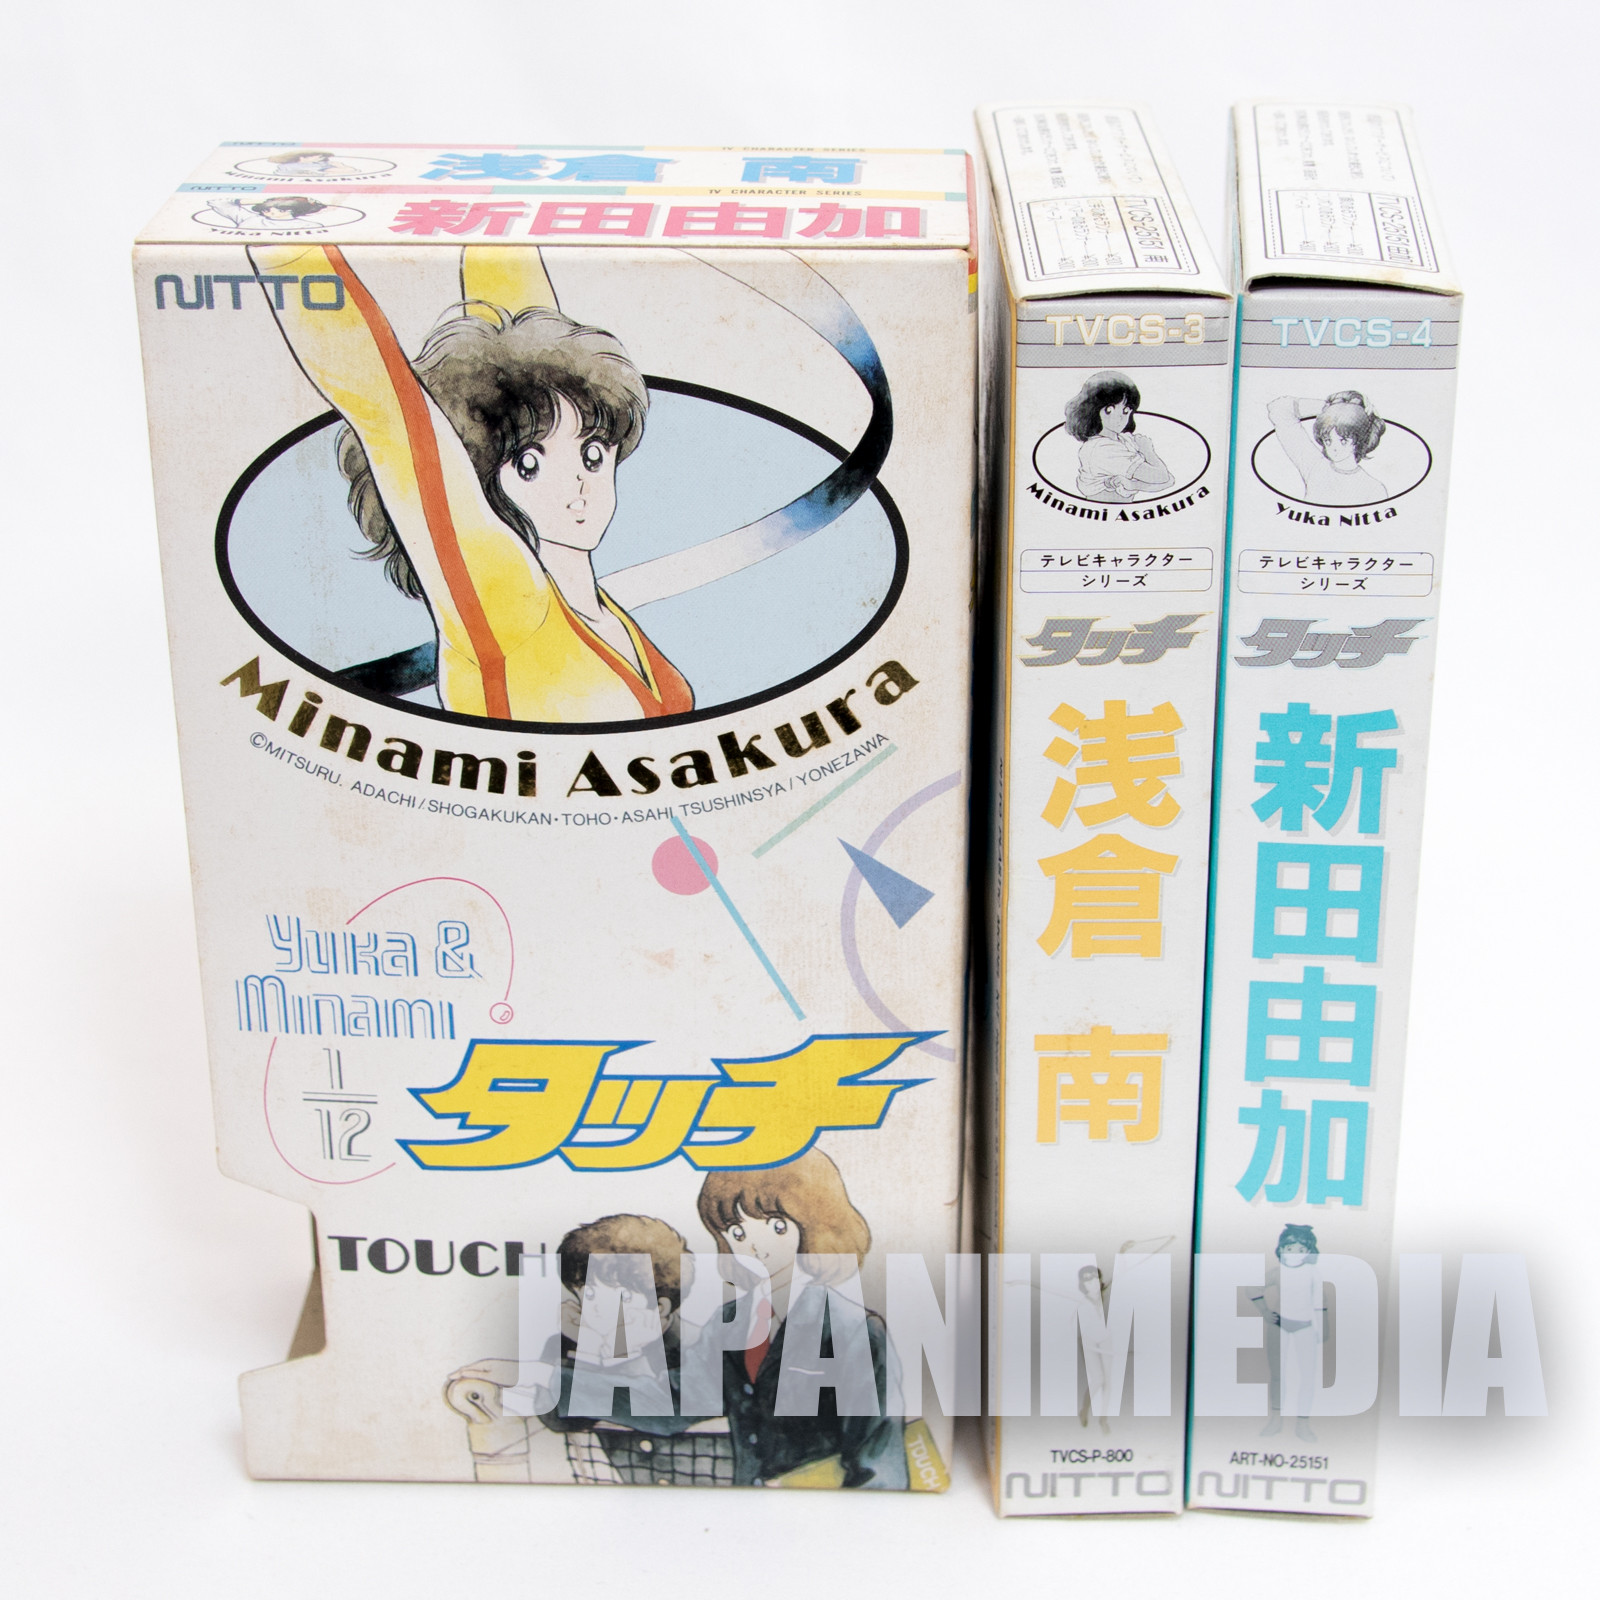 TOUCH Minami Asakura & Yuka Nitta 1/12 Plastic Model Kit JAPAN MITSURU ADACHI